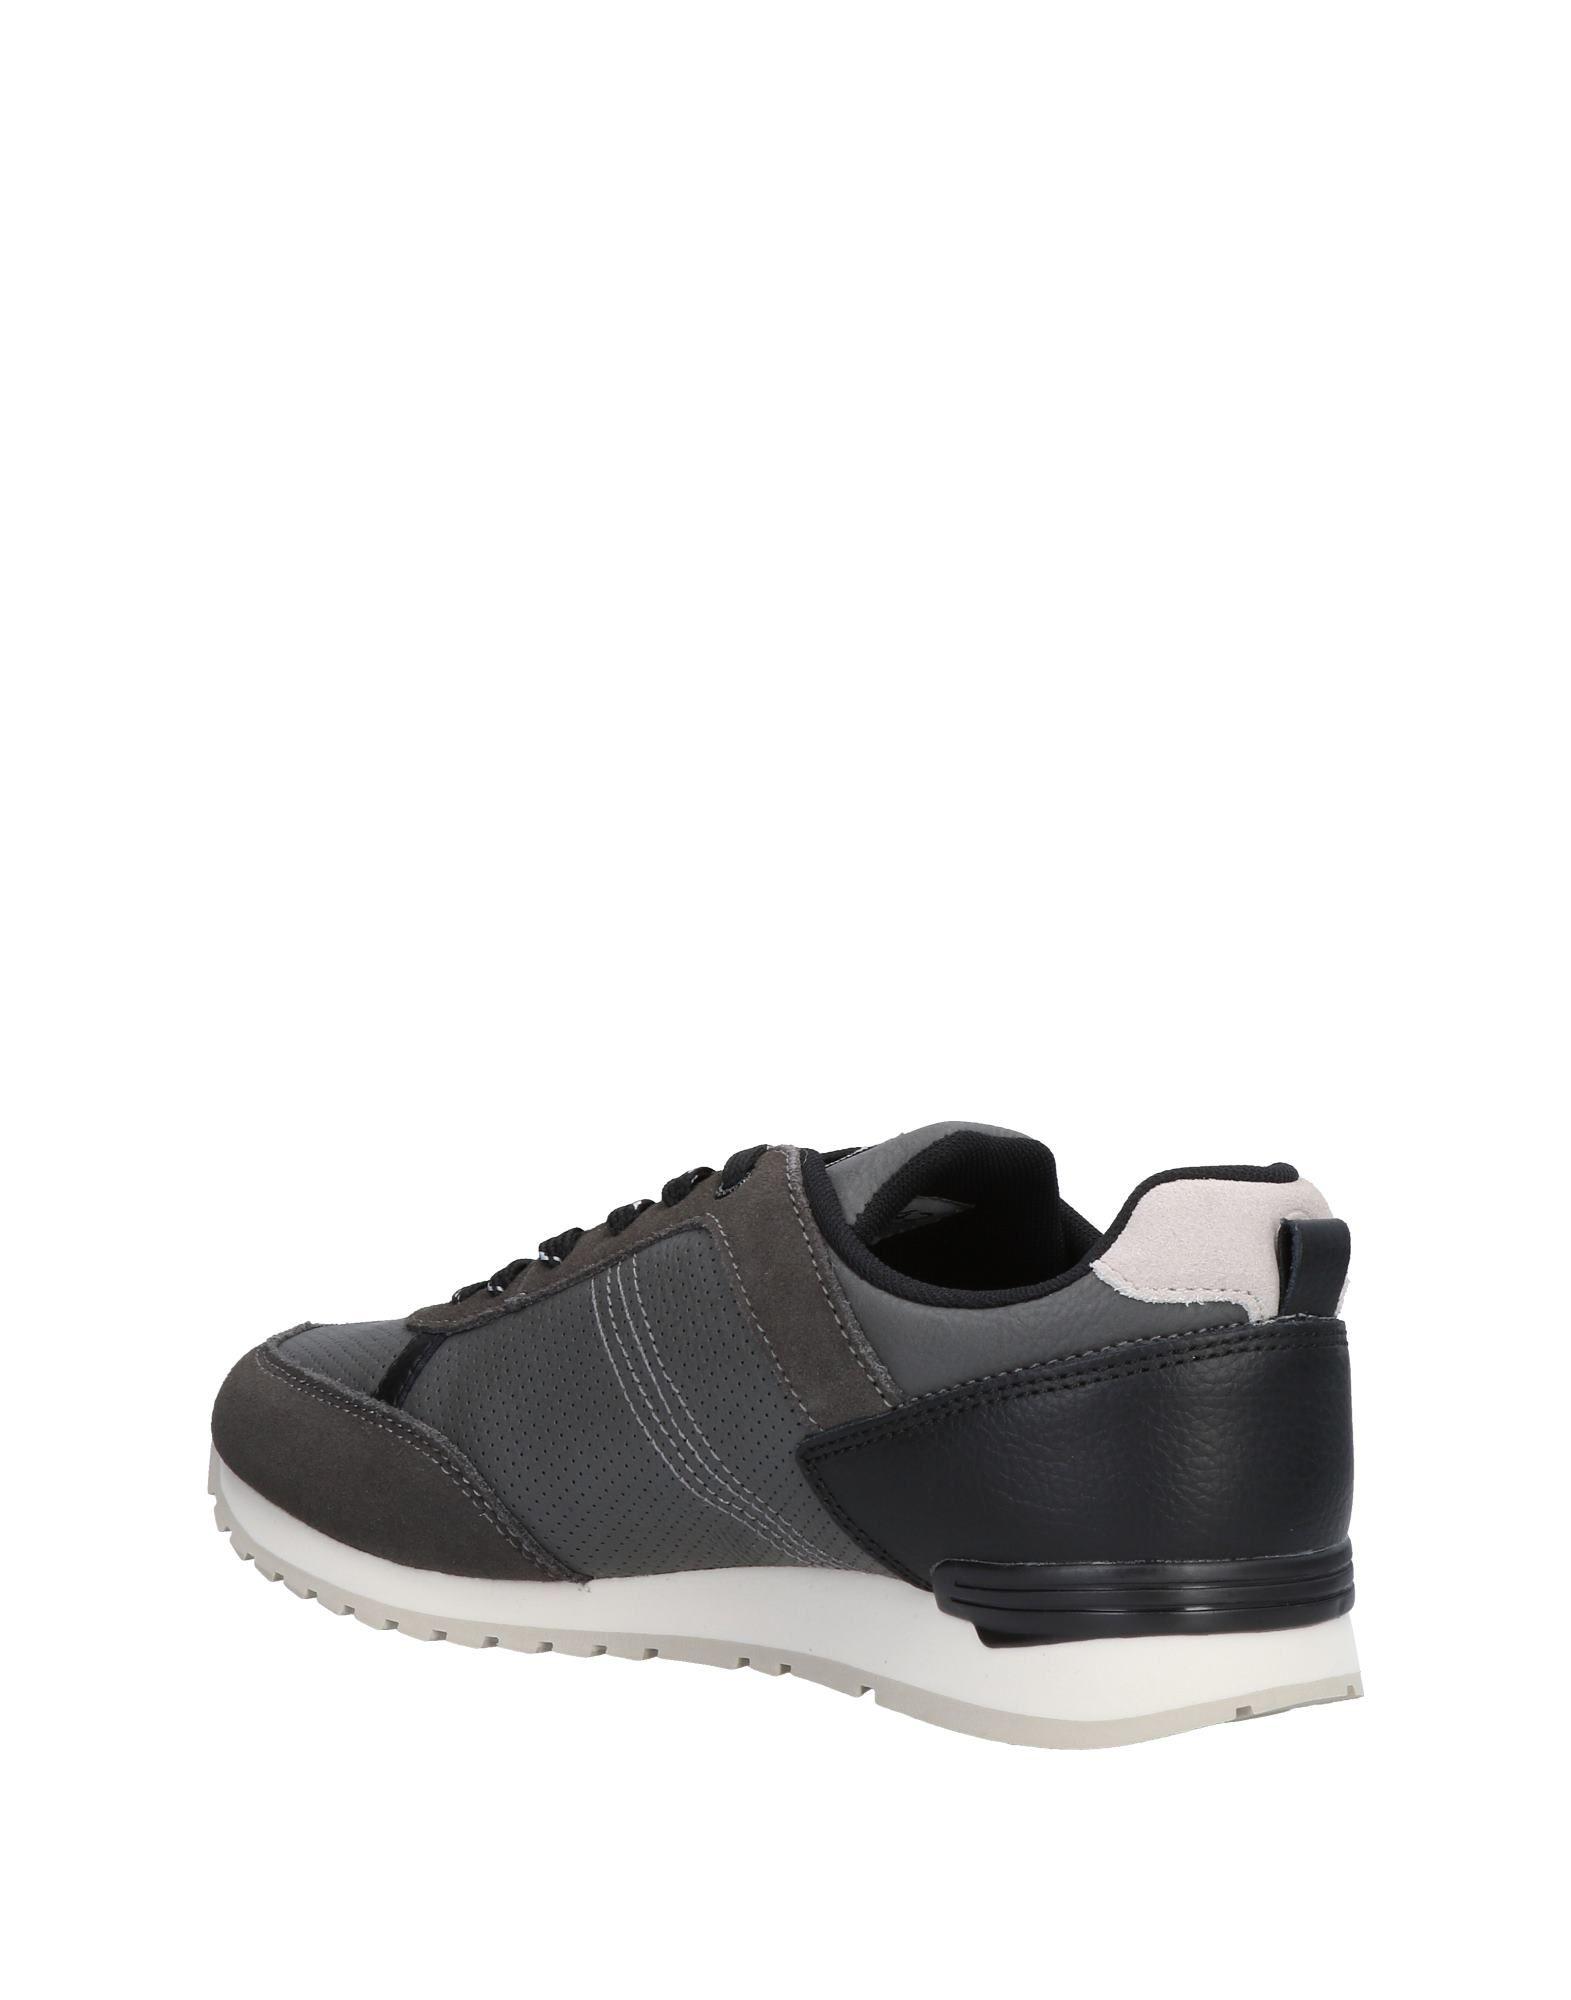 11467758GV Colmar Sneakers Herren  11467758GV  e3d8de